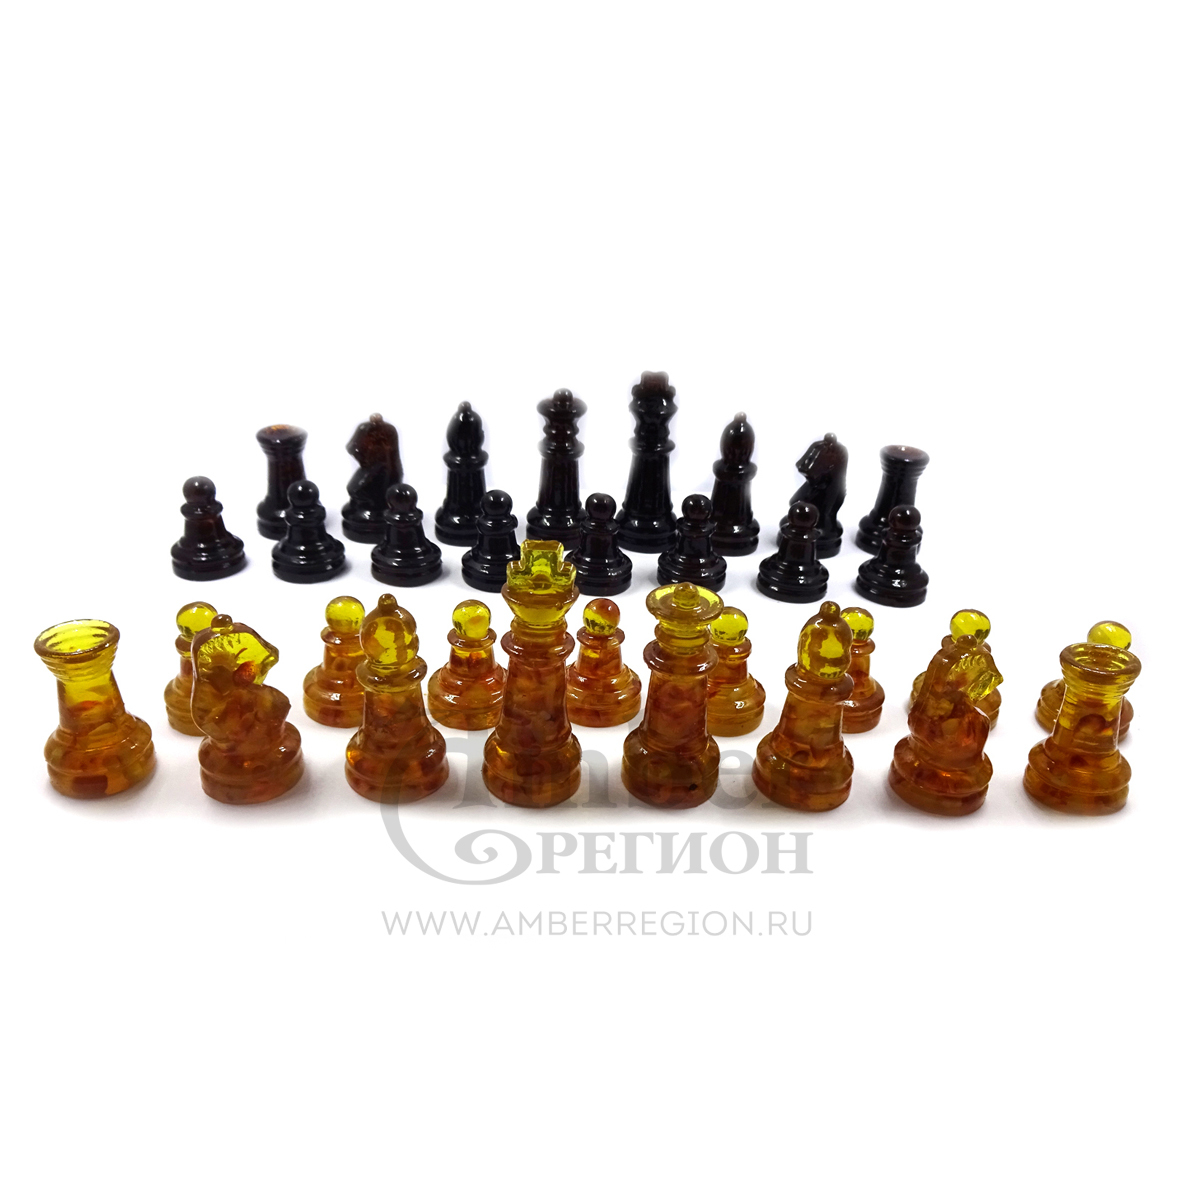 Шахматы малые для досок 25*25 см